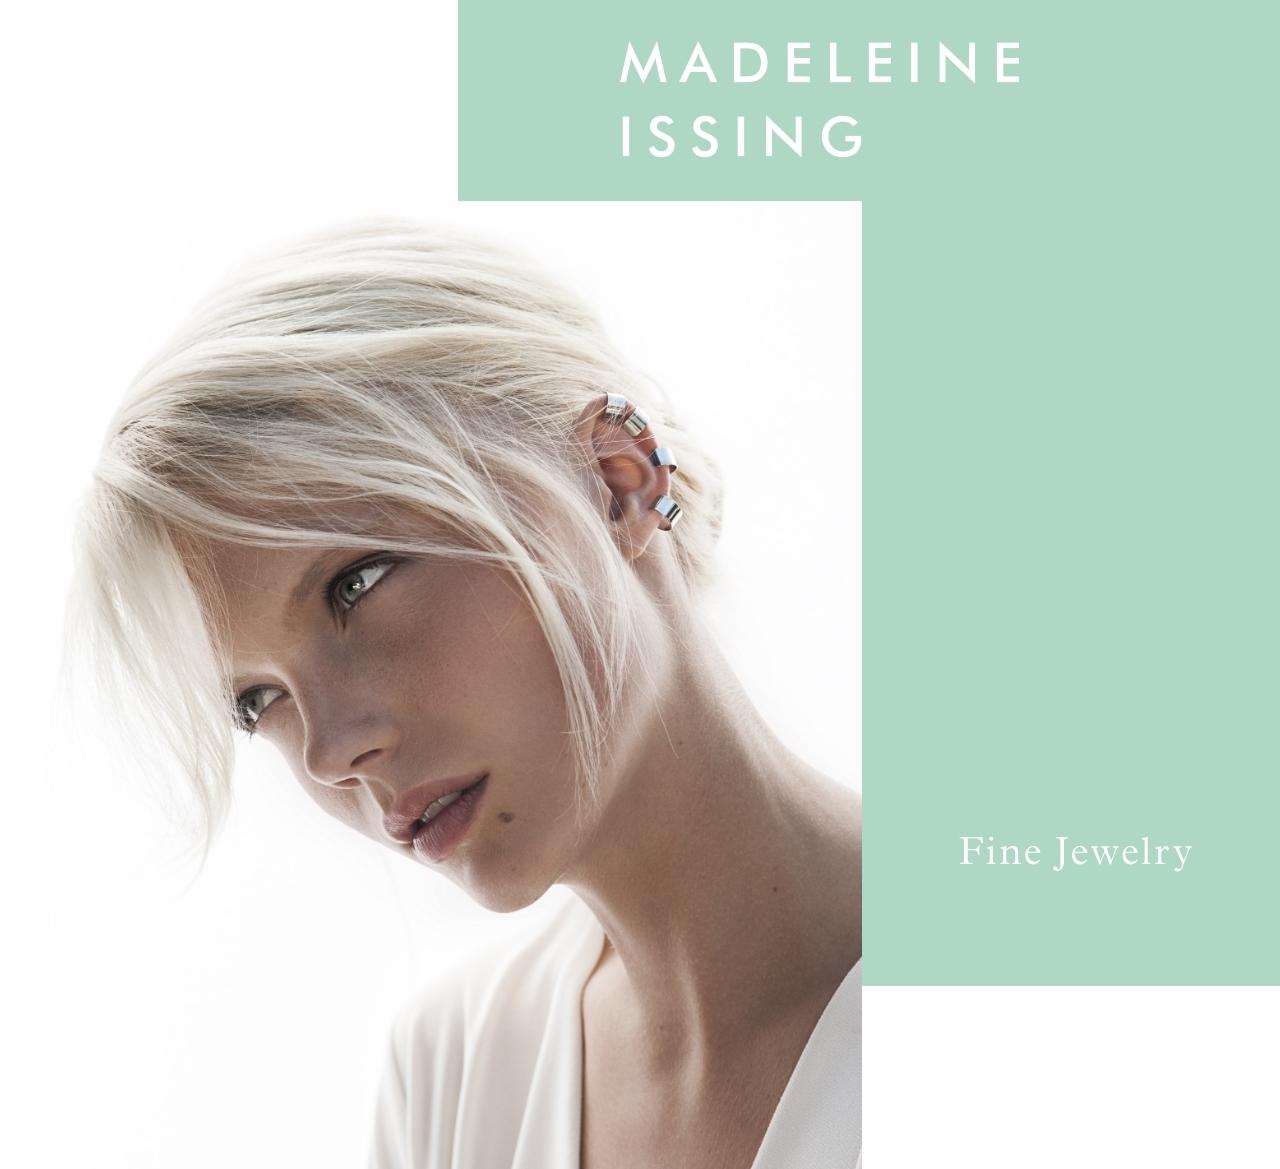 Ohrringe ohne Ohrloch Ear Cuffs und Ohrclips Madeleine Issing 2